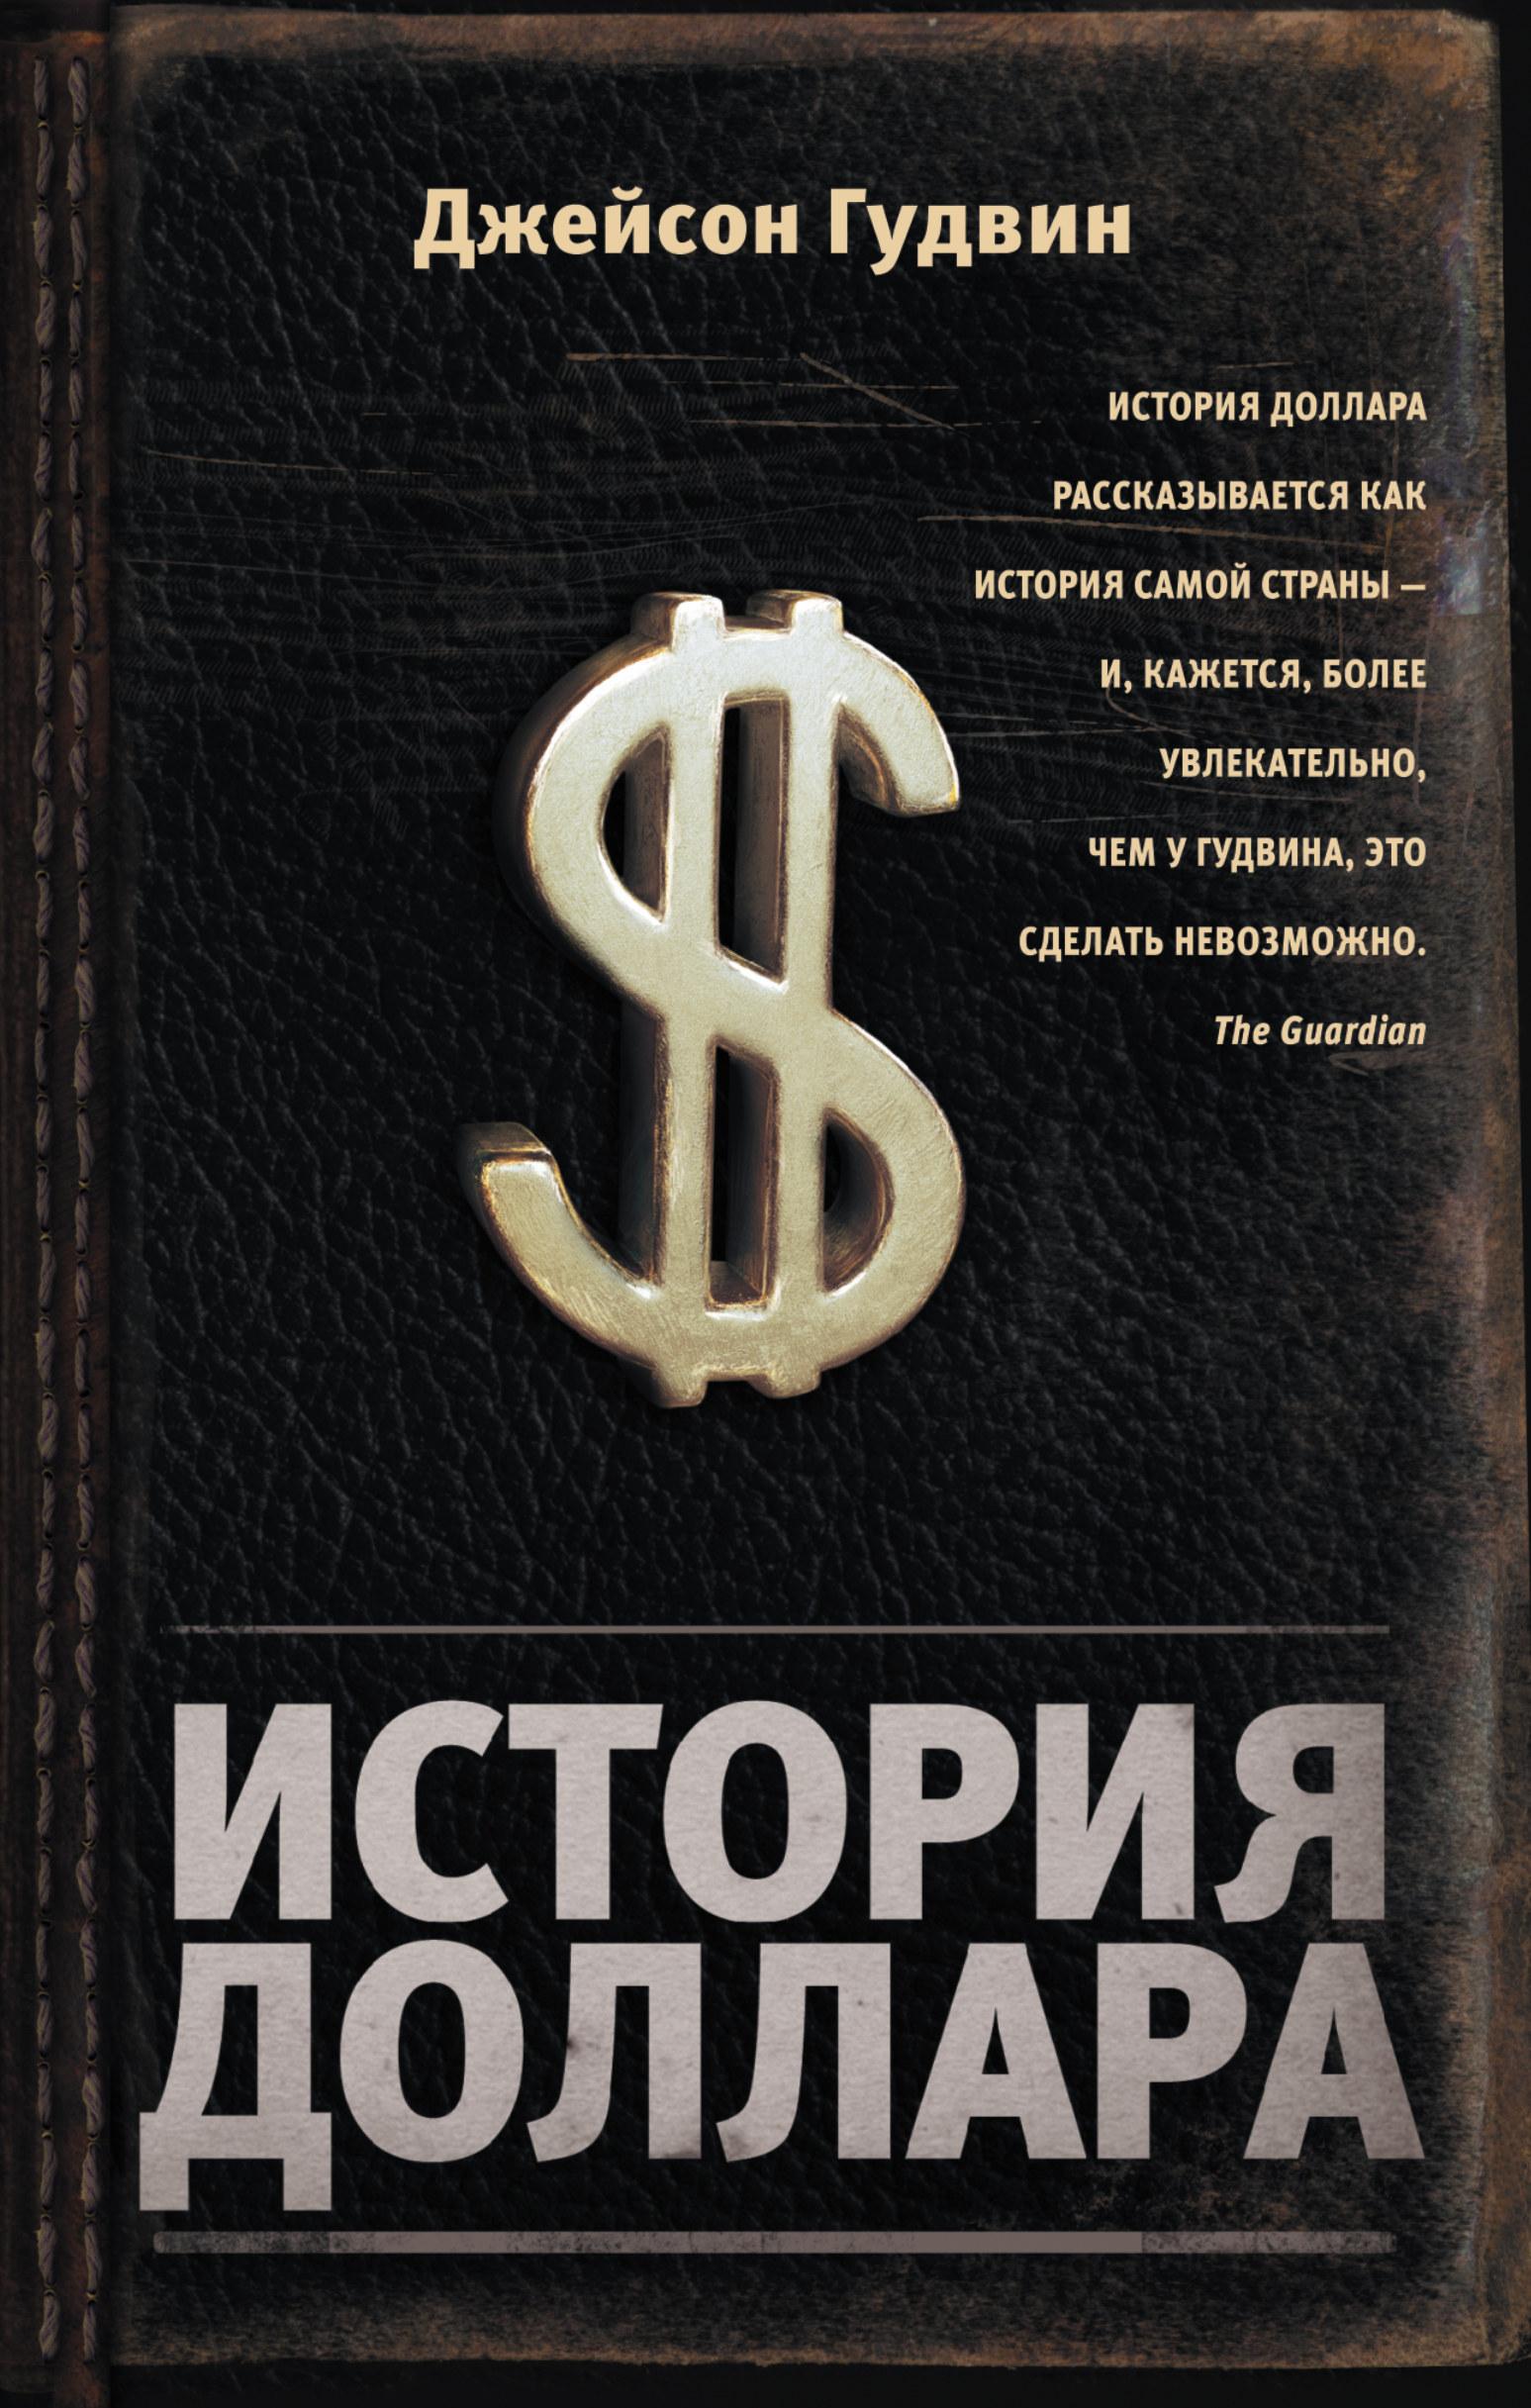 Джейсон Гудвин История доллара гудвин дж история доллара